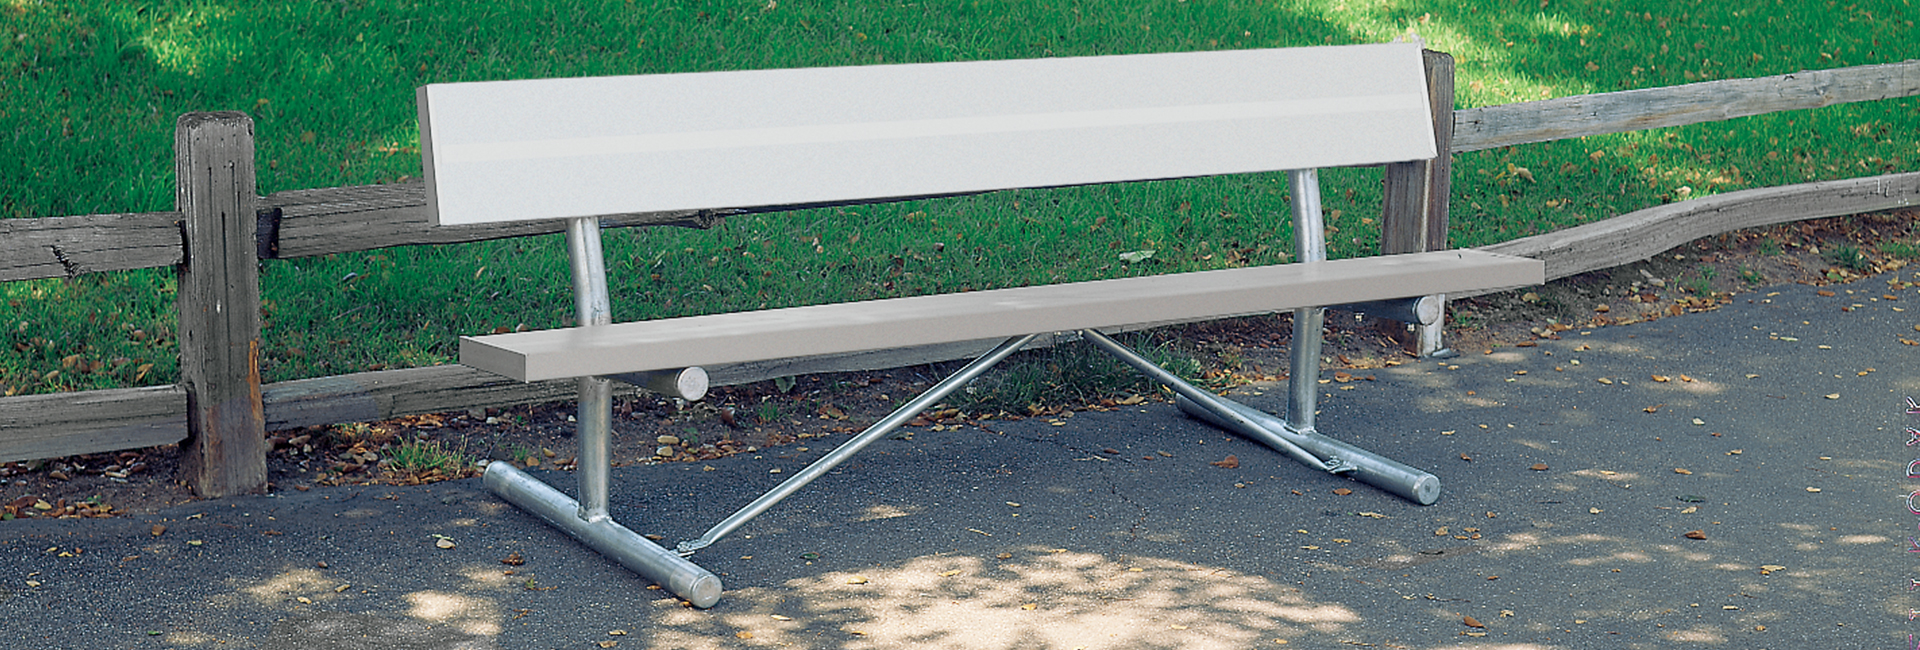 Bench Manufacturer Picnic Table Provider Playworks San